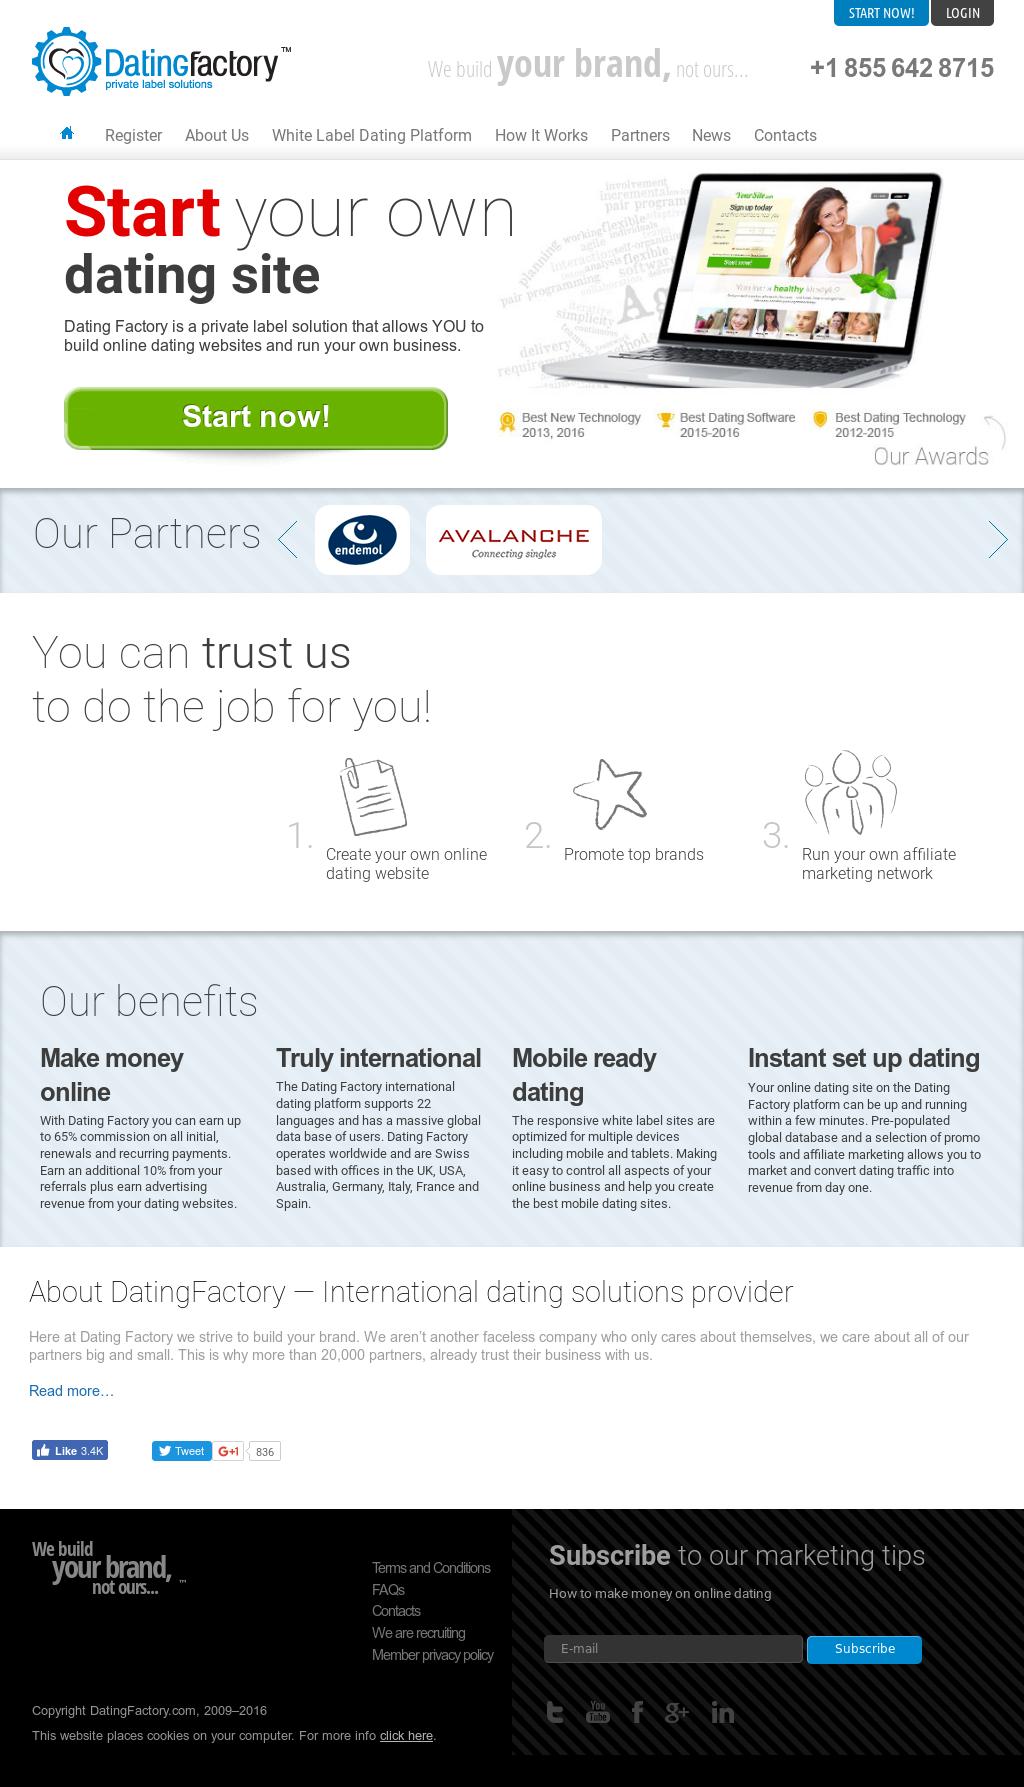 Whitelabeldating provider portal